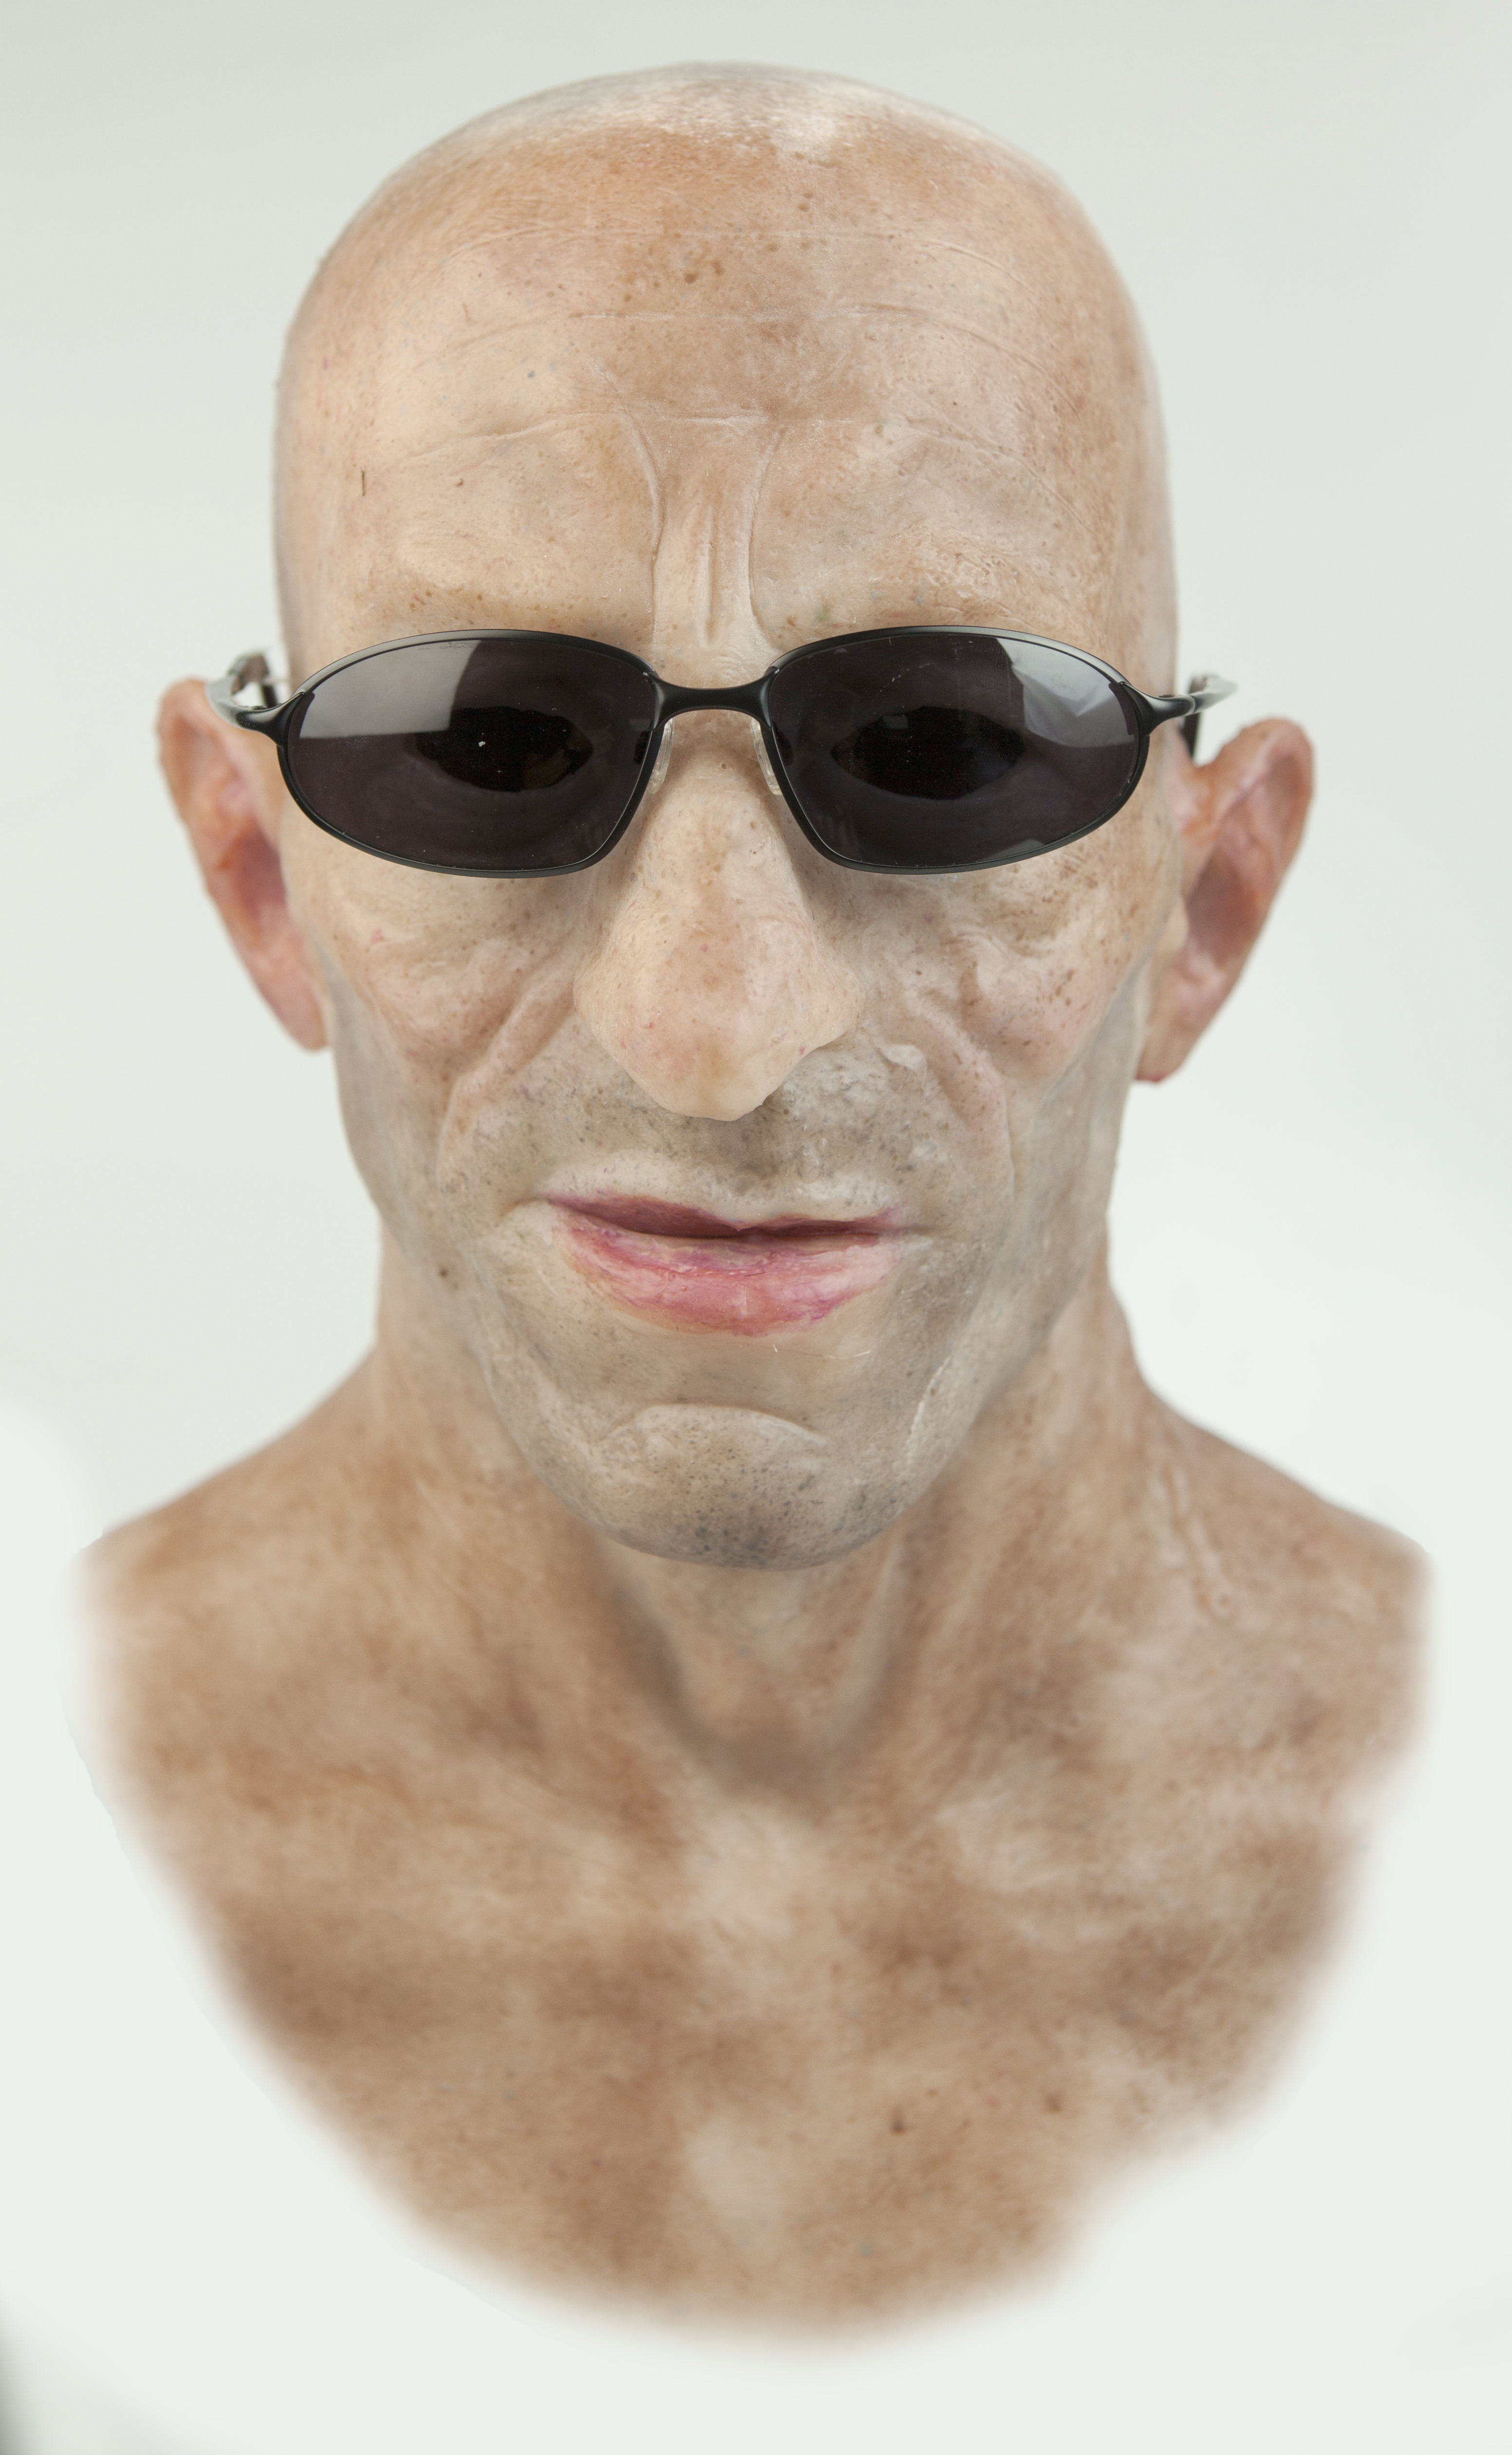 Realistic silicone masks